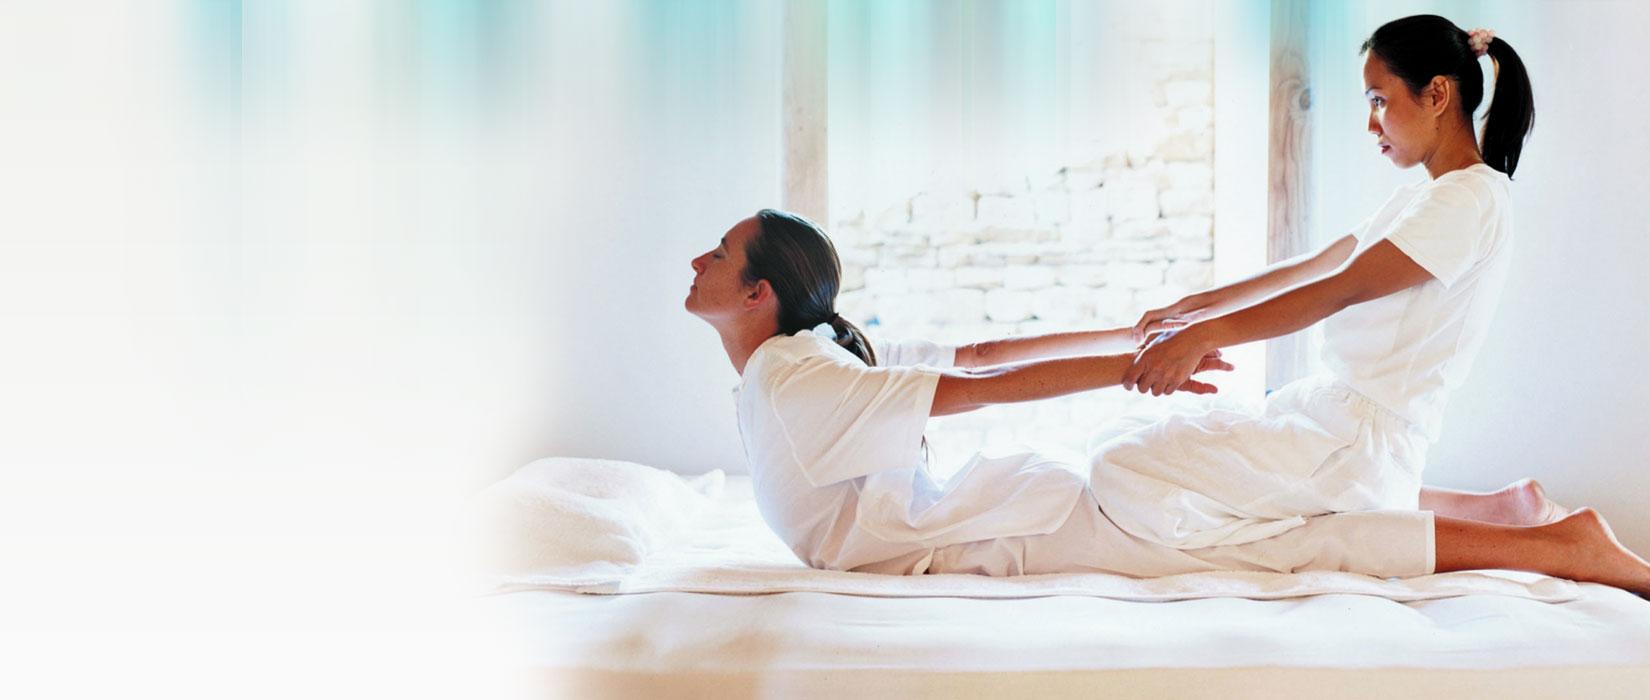 gratis video sex montra thai massage